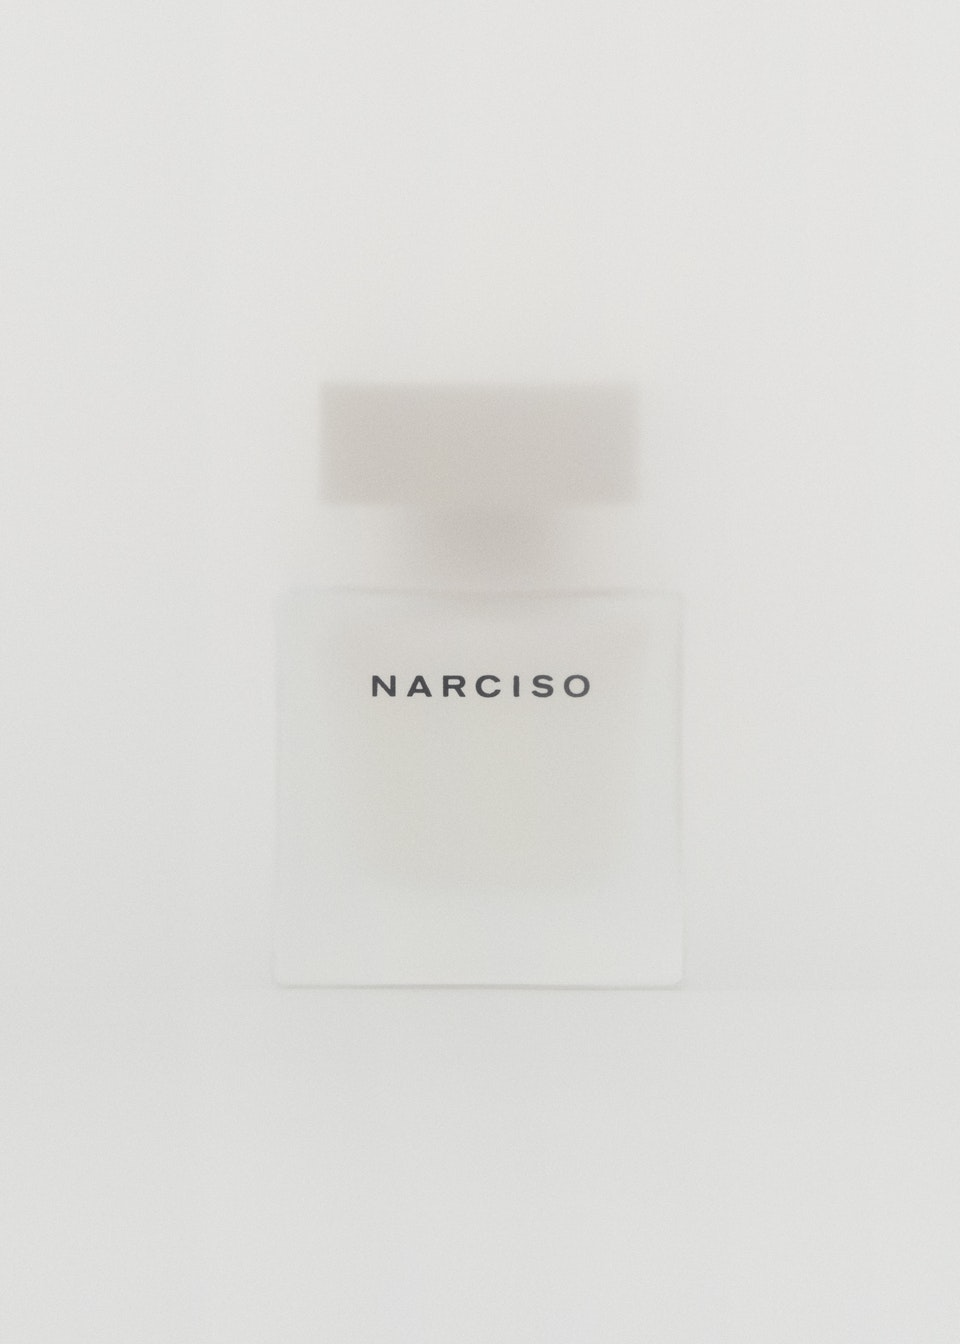 Narciso Rodriguez Perfume - Stills BLOOM_NARCISO_PARFUM_7